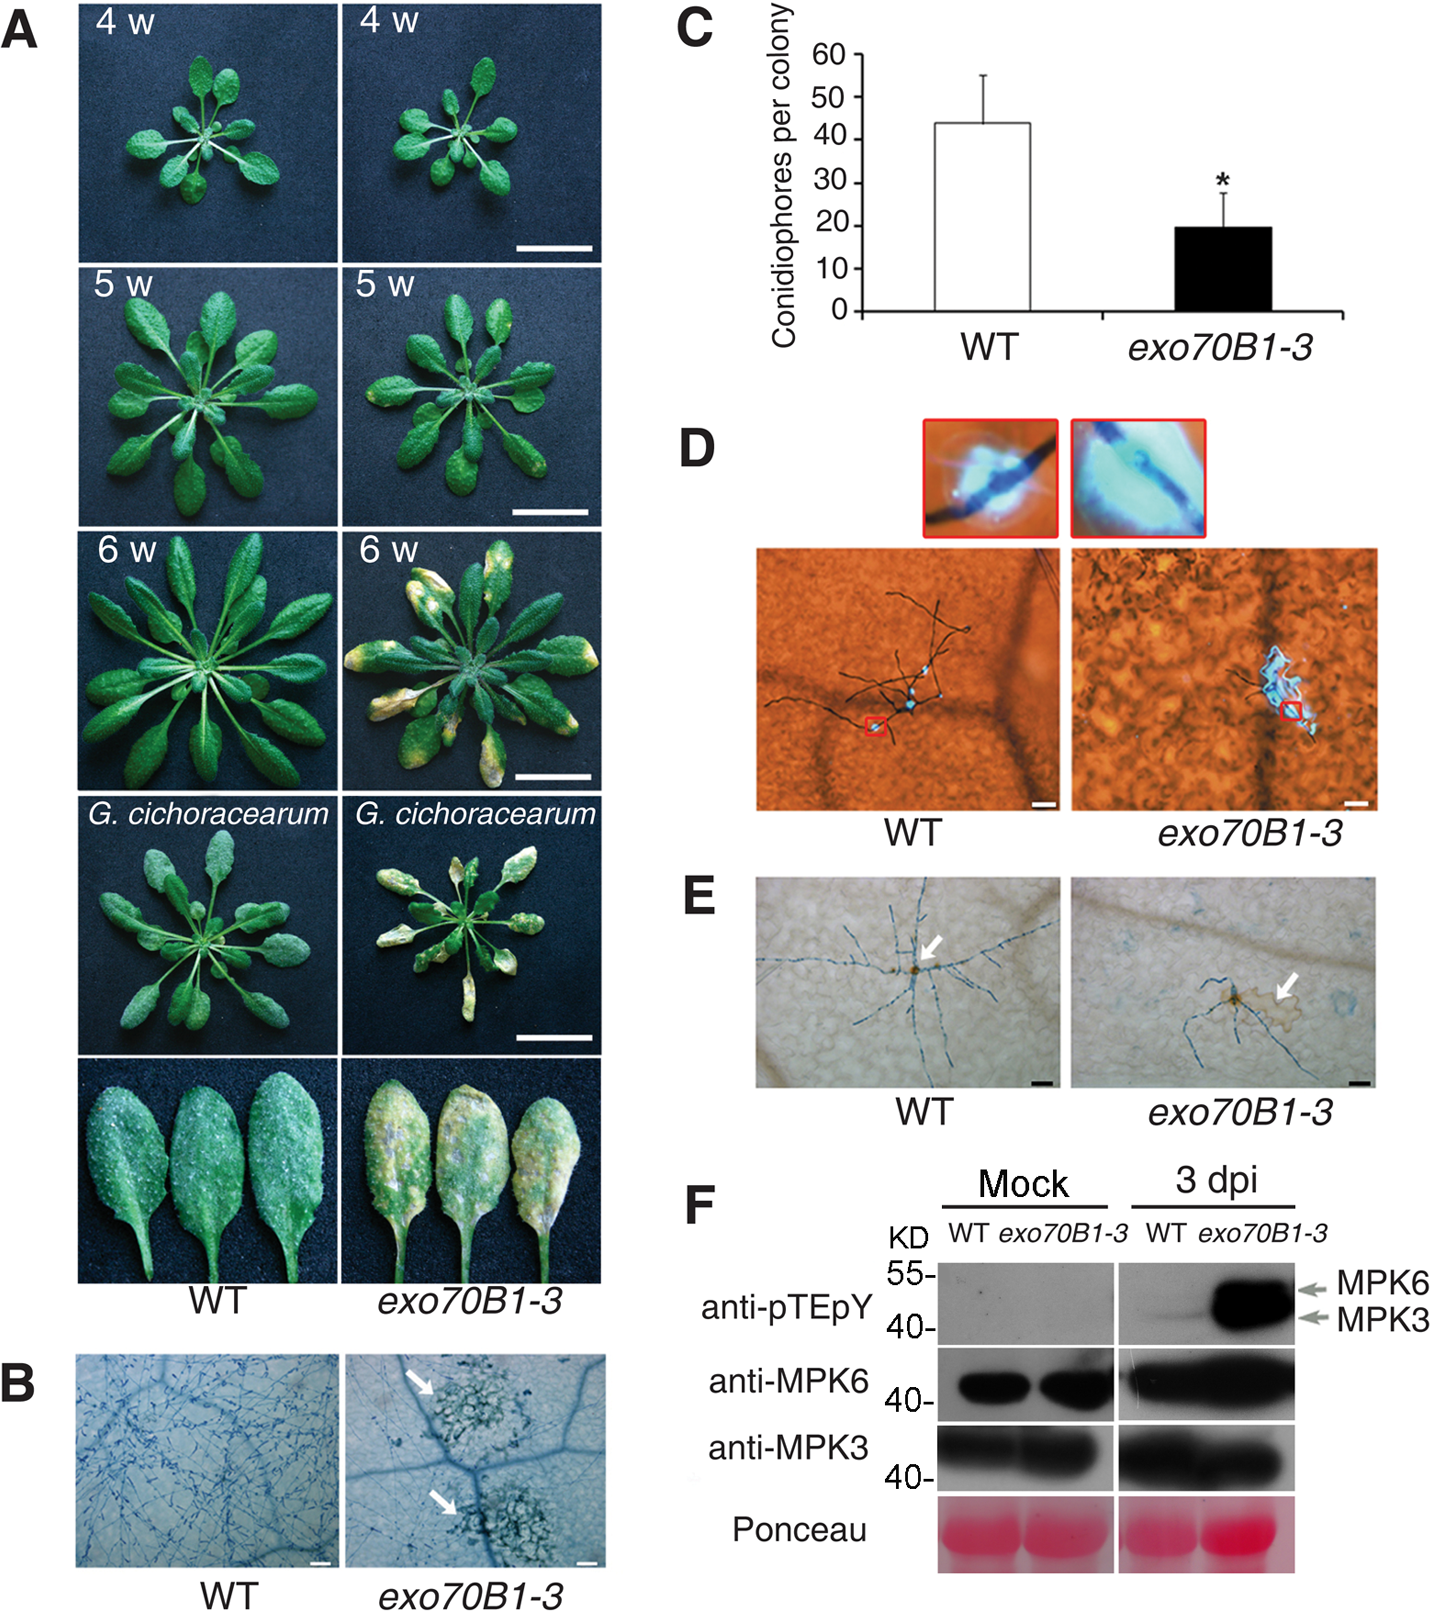 <i>exo70B1-3</i> mutants display enhanced resistance to <i>G. cichoracearum</i>.